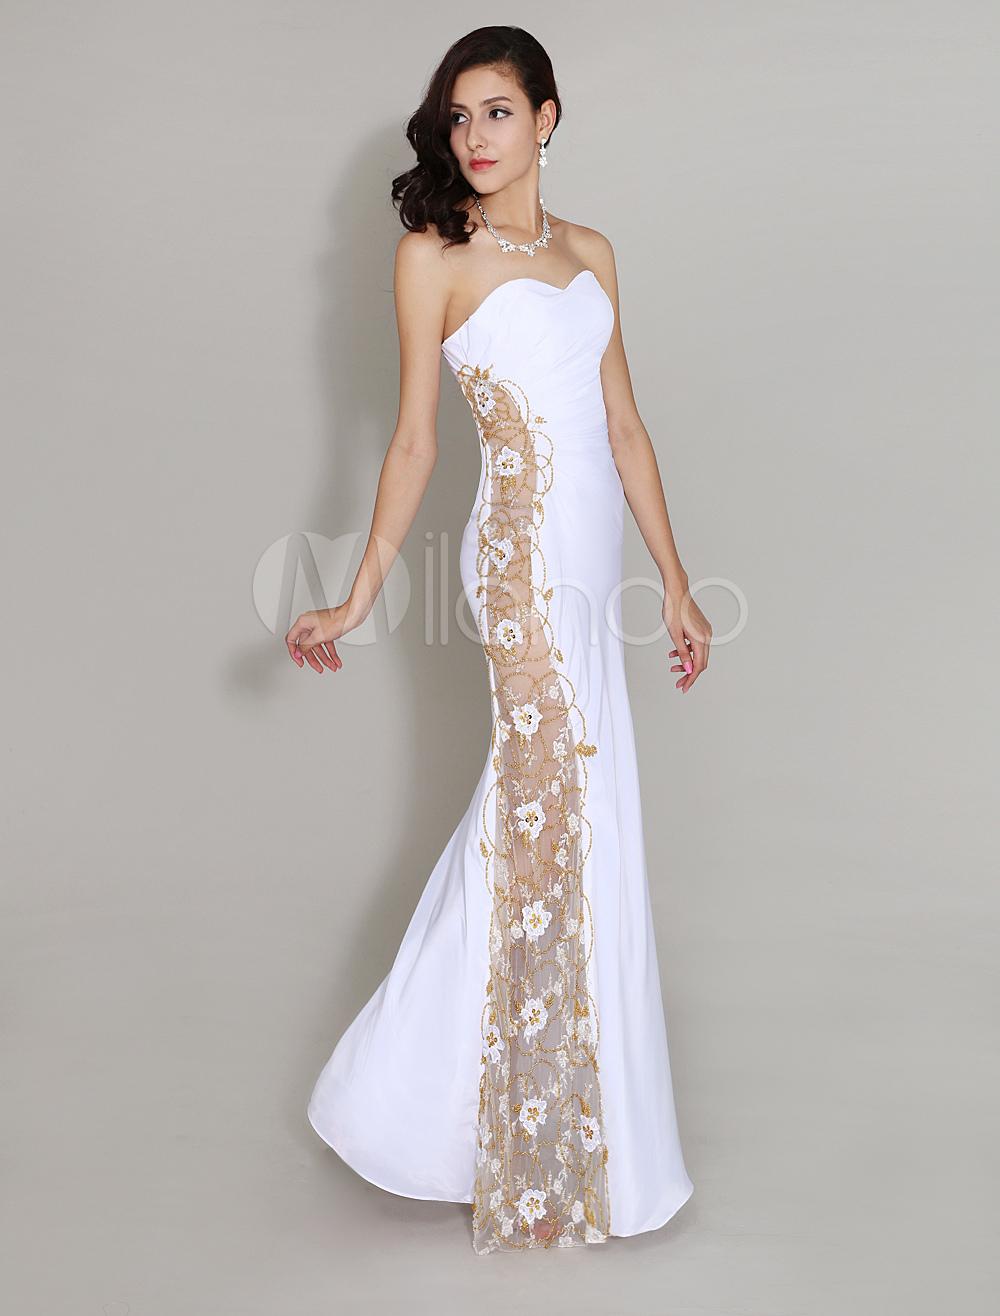 Robe de soiree blanc et or